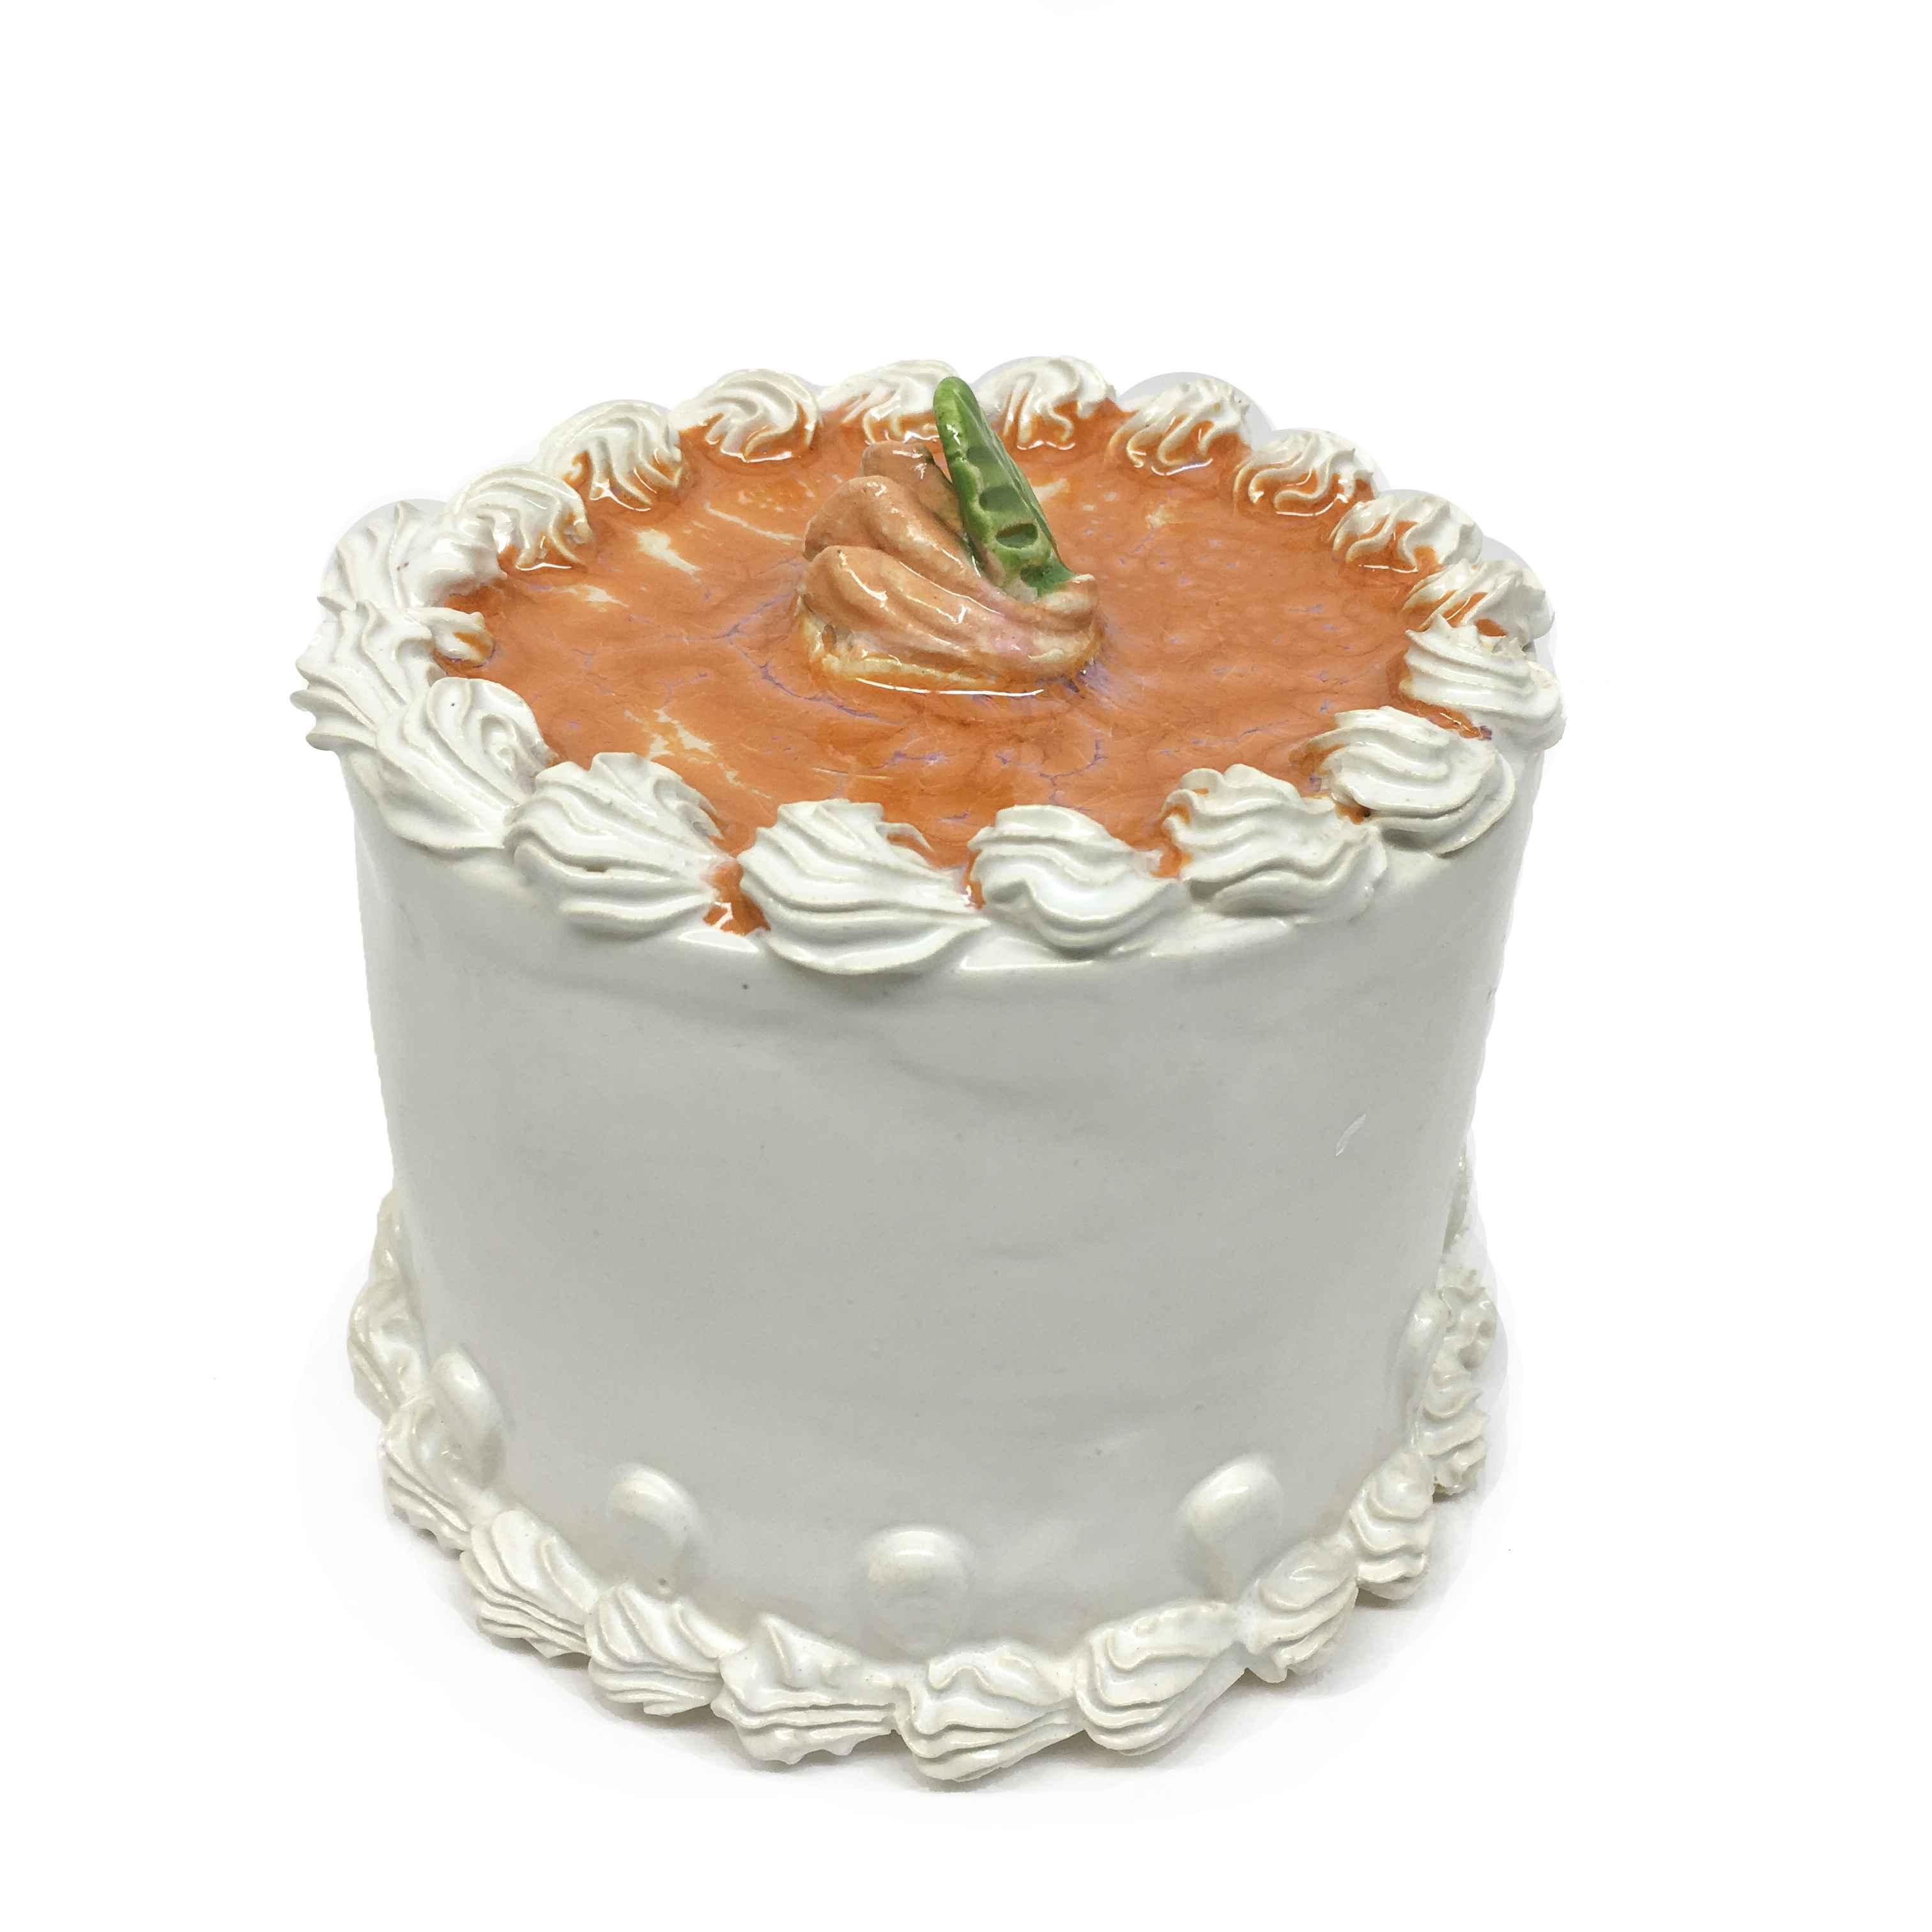 Orange Cake With Rose...  by  Jeff Nebeker